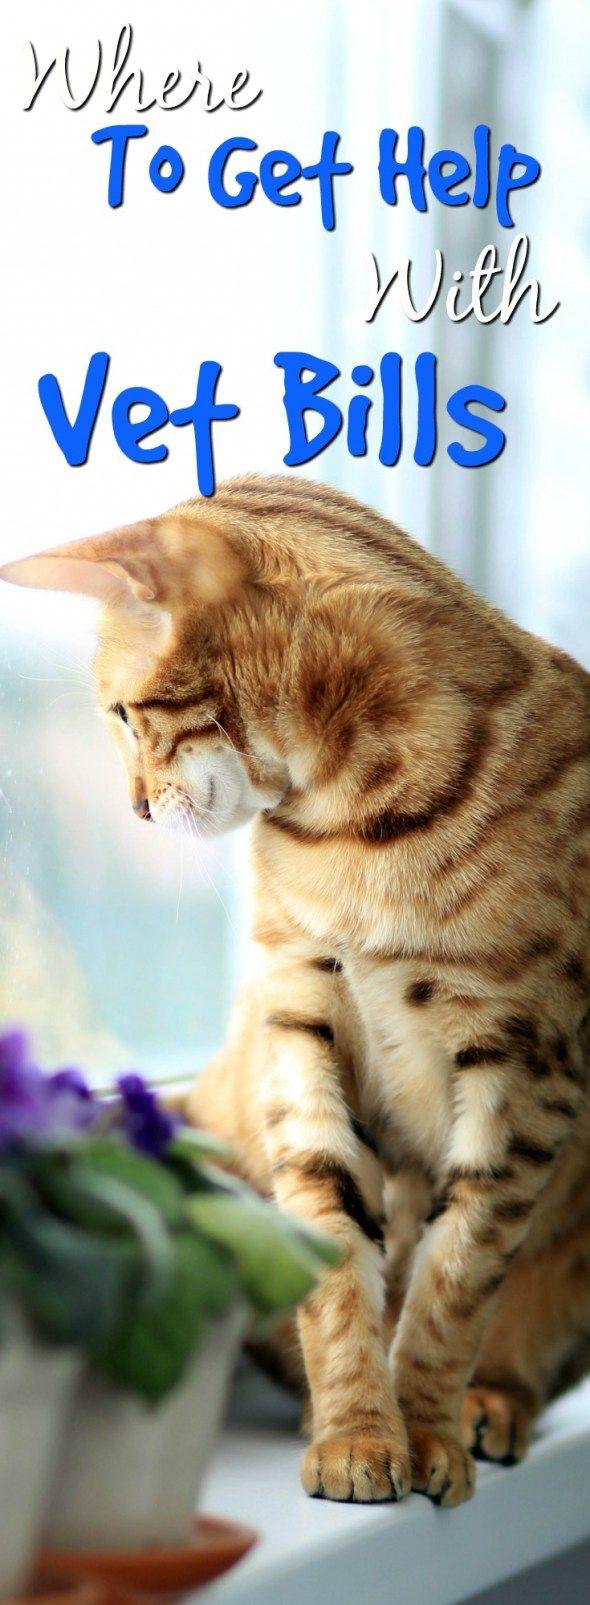 Help With Vet Bill Affordability Vet bills, Vets, Cat